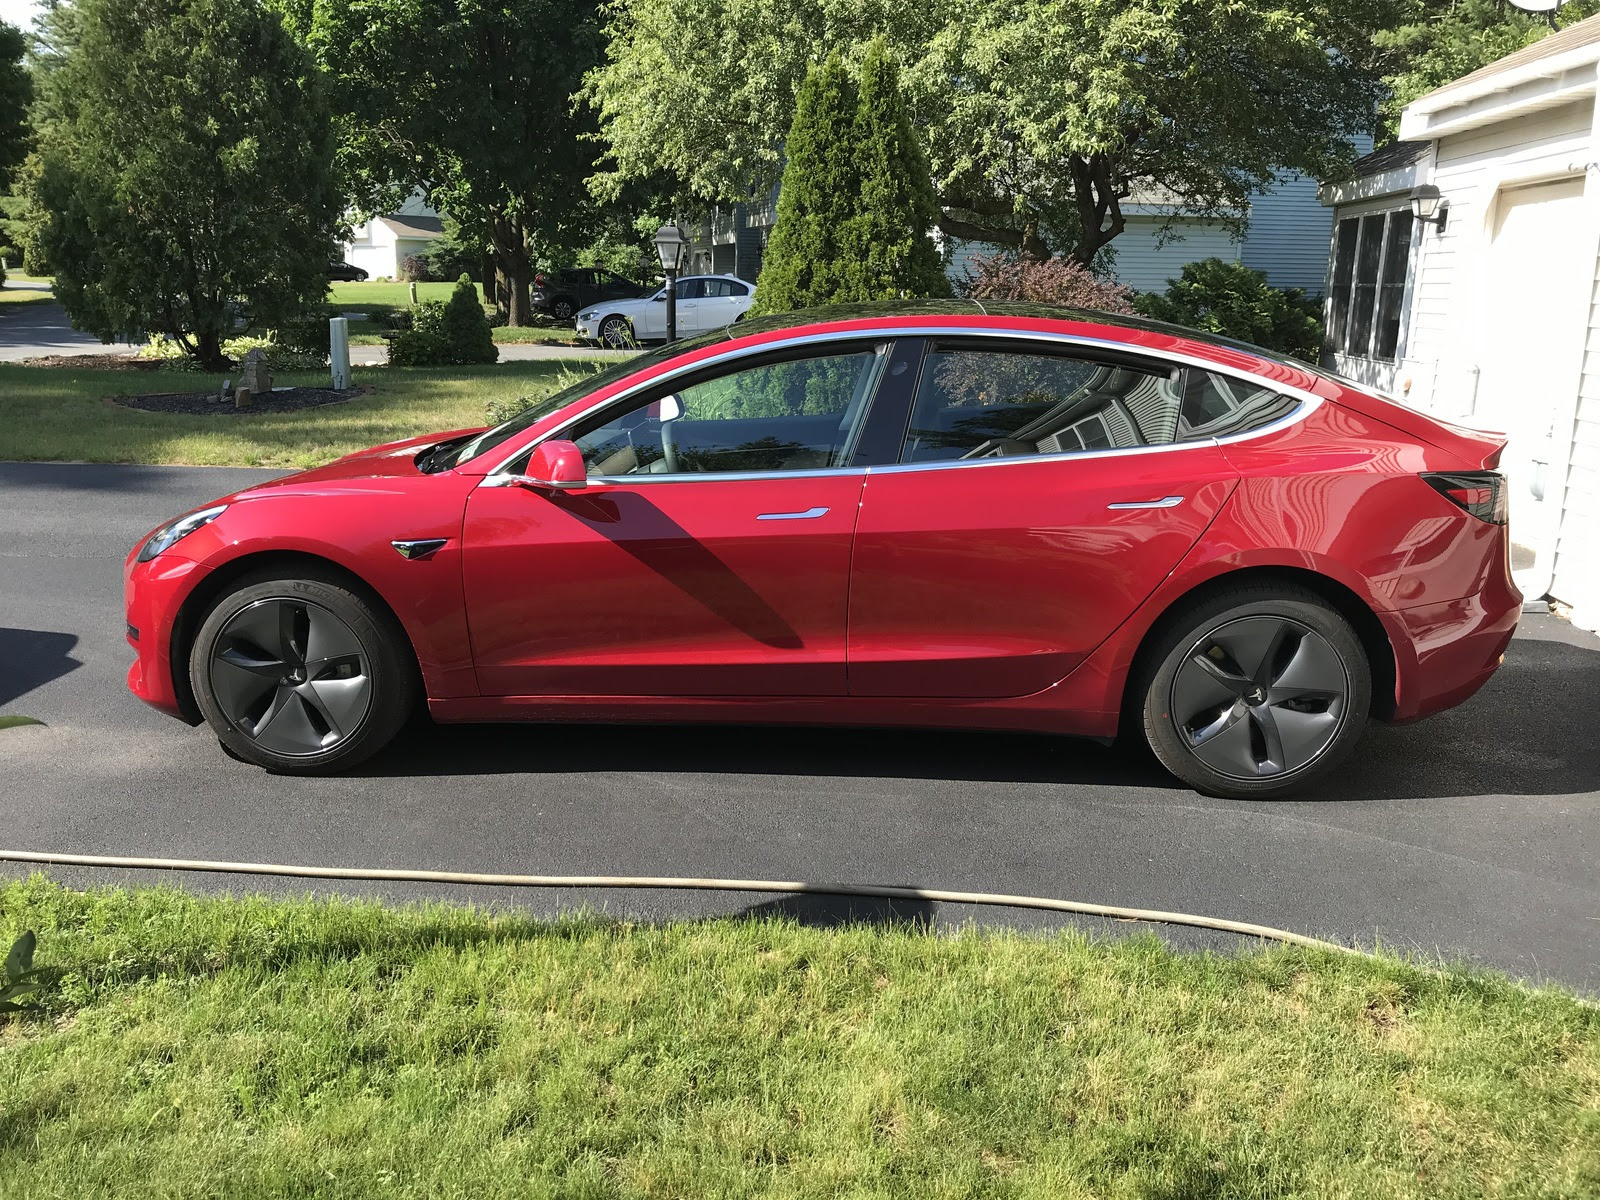 Stock 2020 Tesla Model 3 Performance Stealth 1 4 Mile Drag Racing Timeslip Specs 0 60 Dragtimes Com